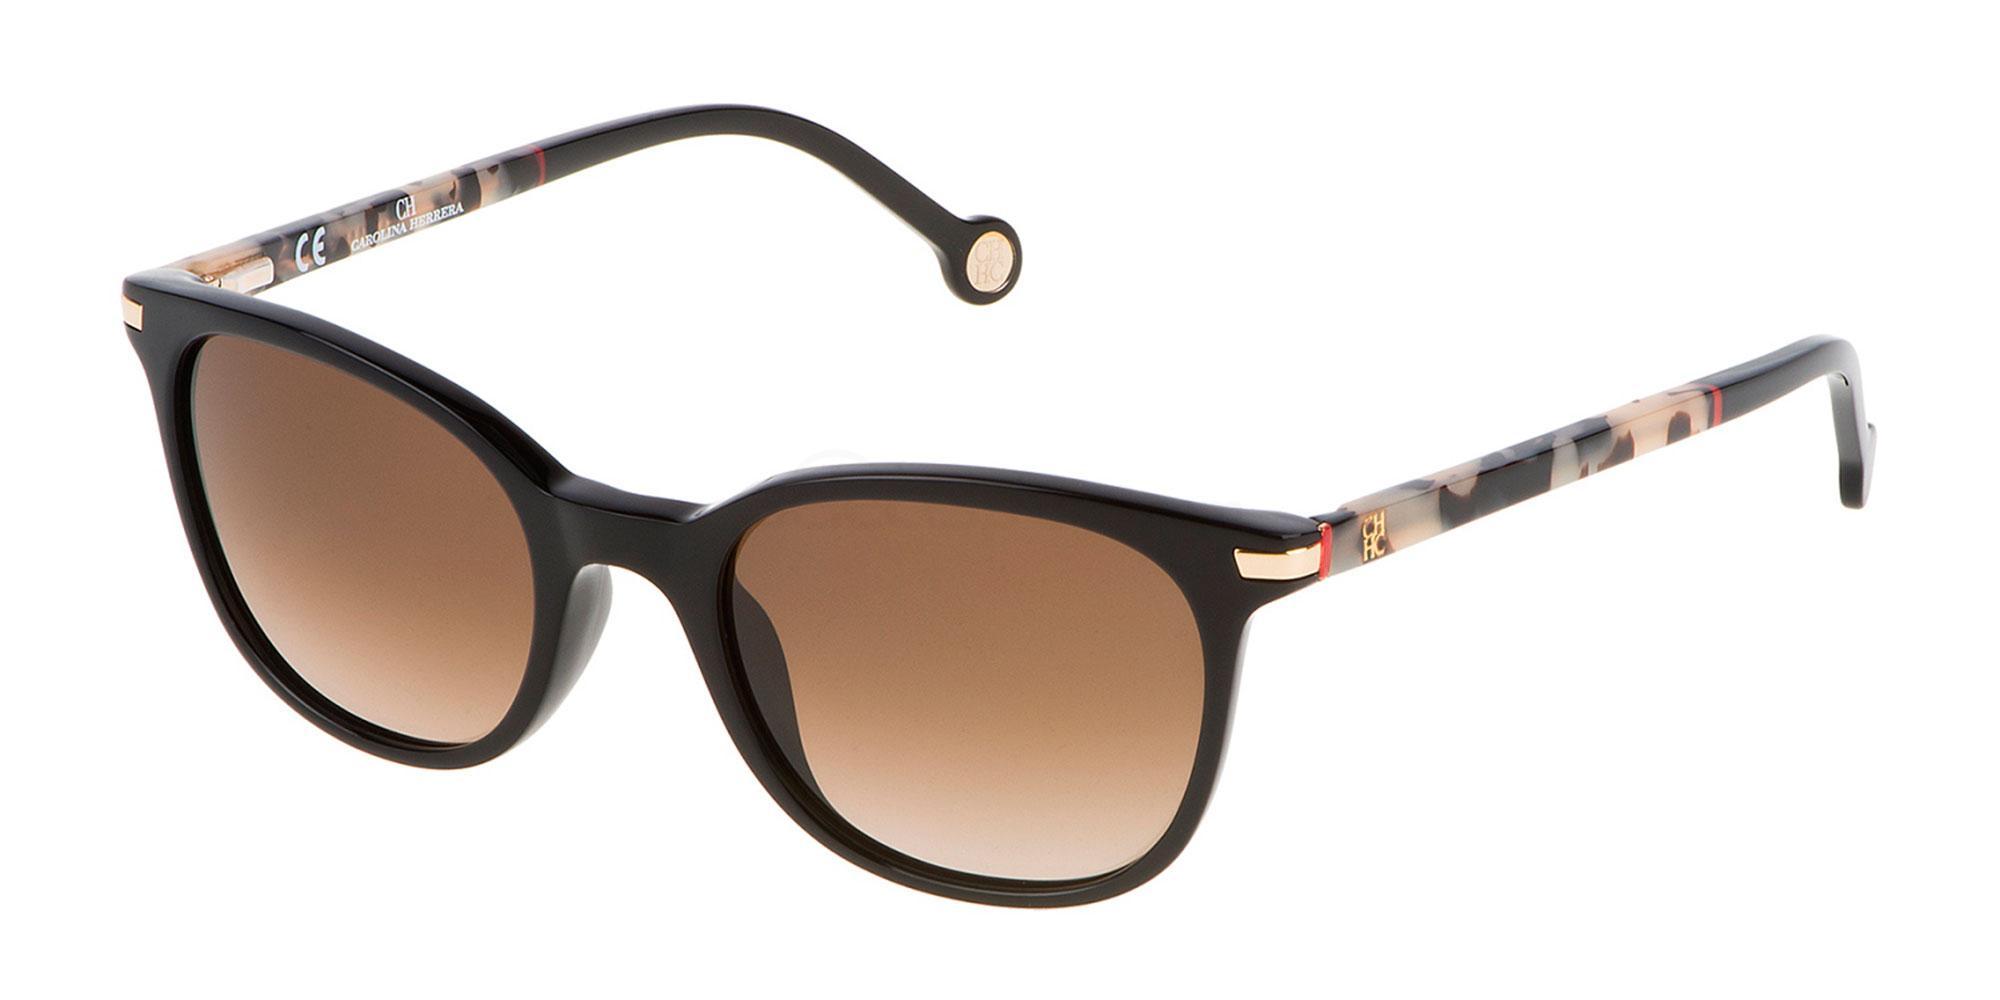 0700 SHE650V Sunglasses, CH Carolina Herrera